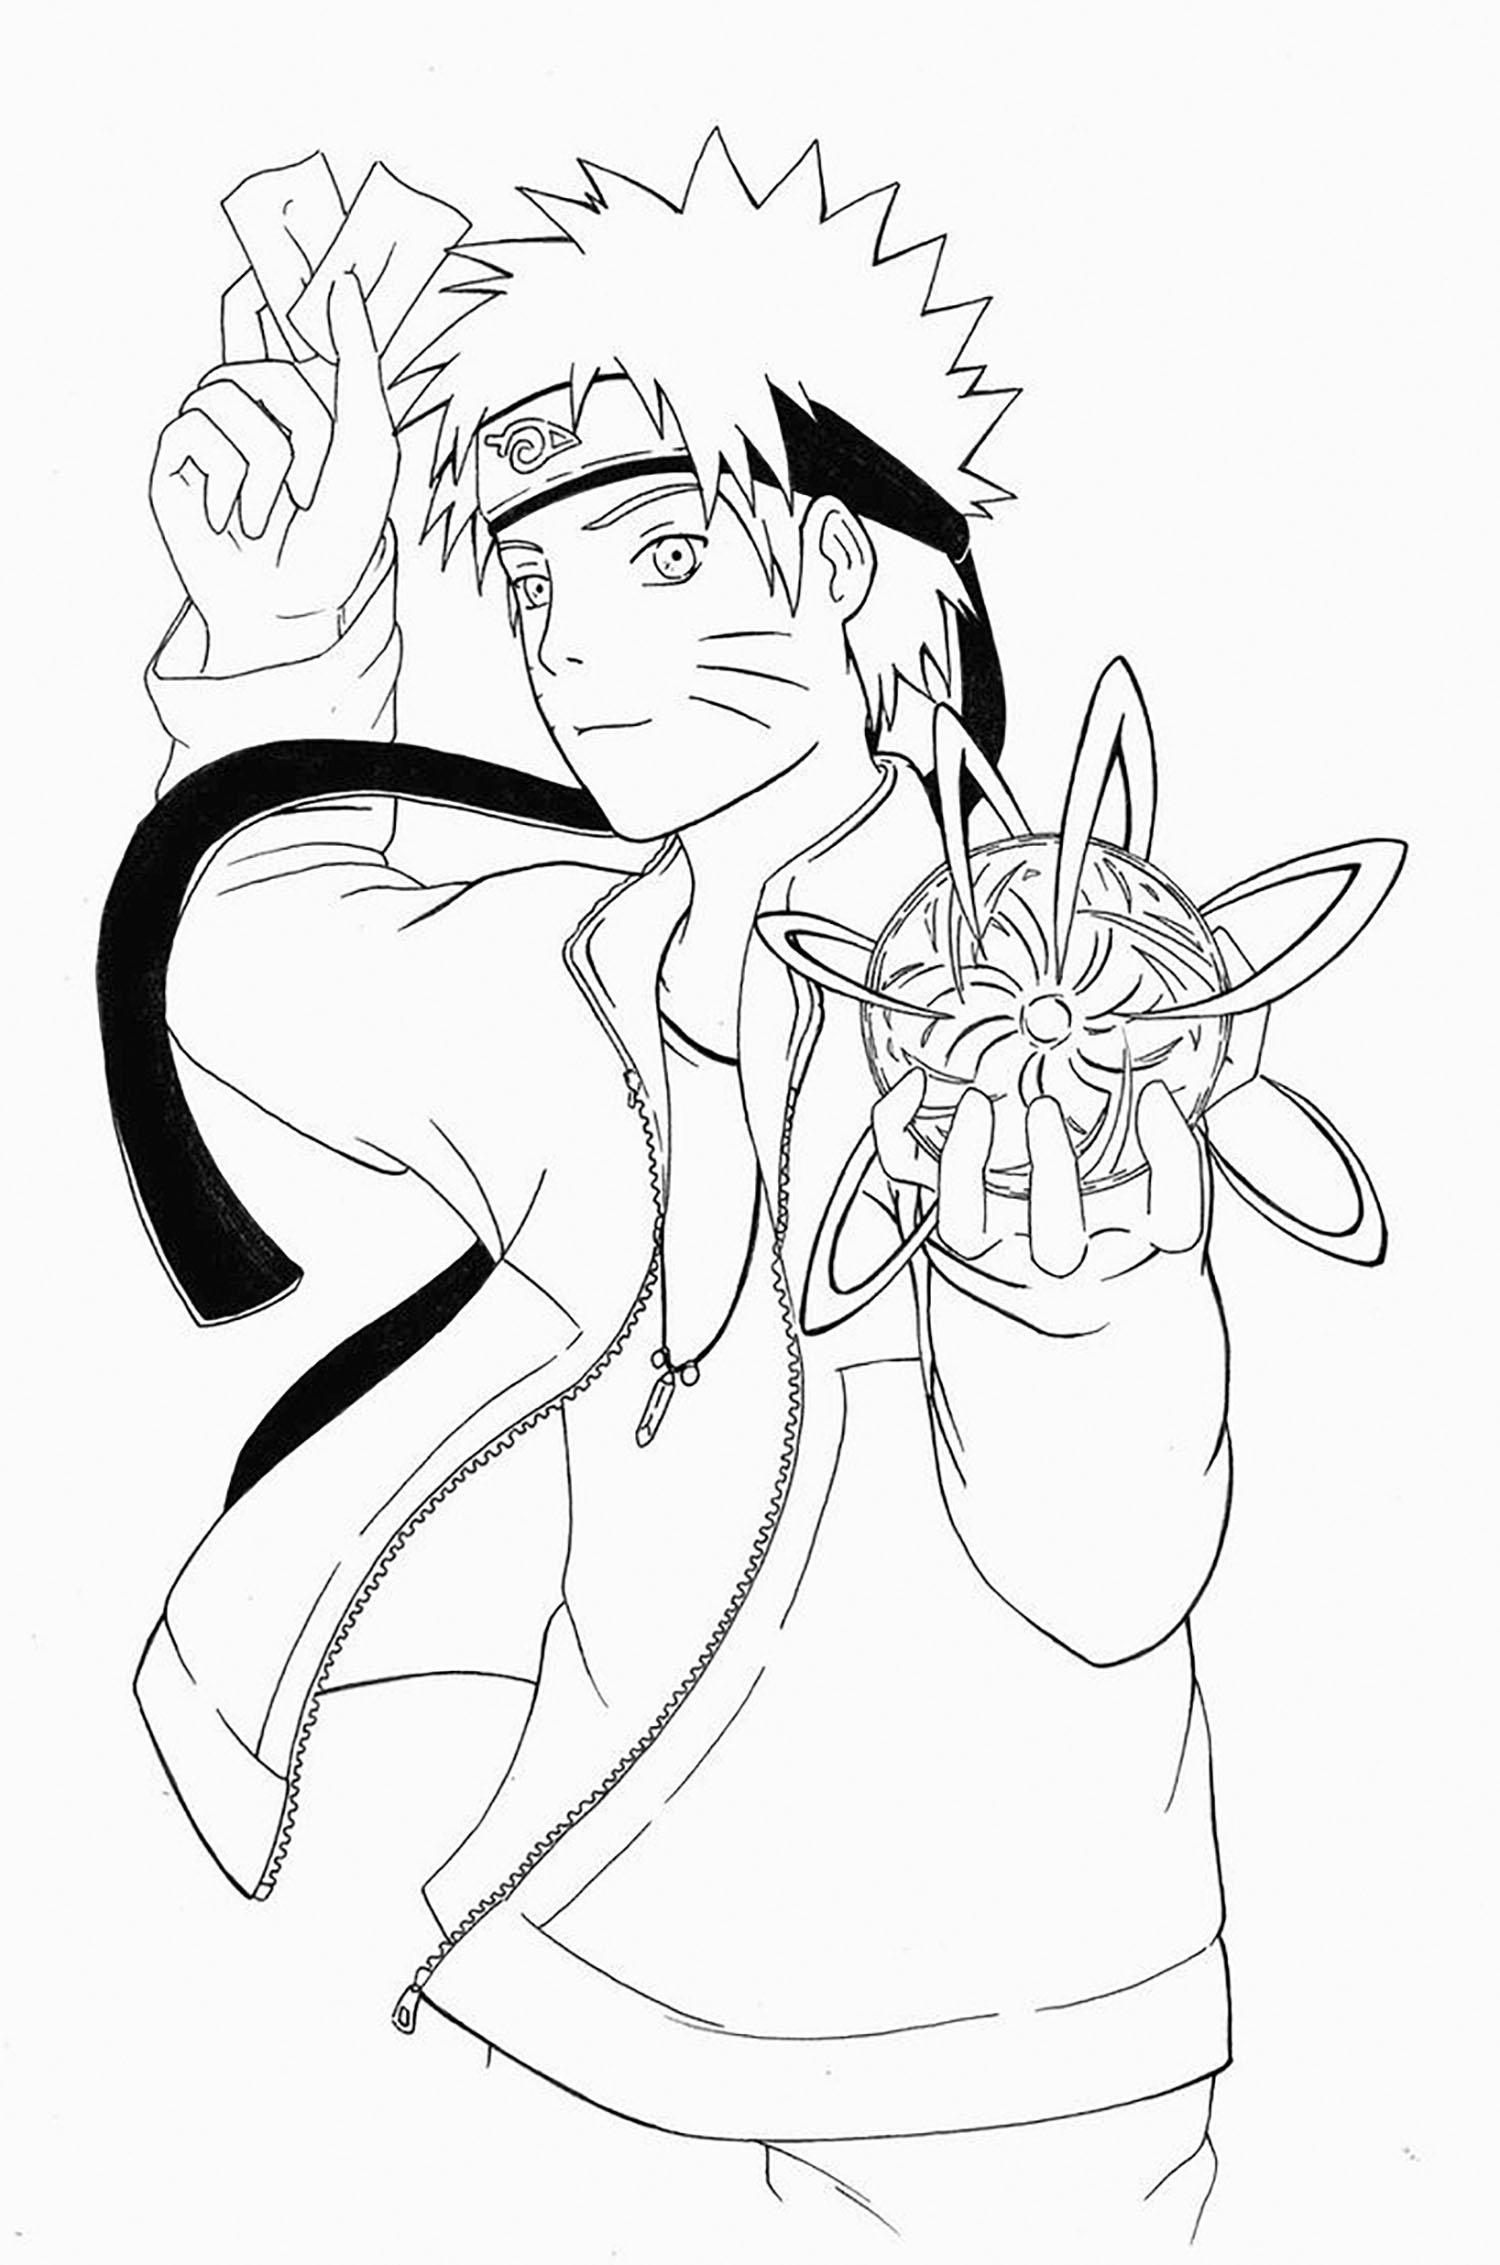 Rasengan - Coloriage Naruto - Coloriages Pour Enfants concernant Dessin Naruto